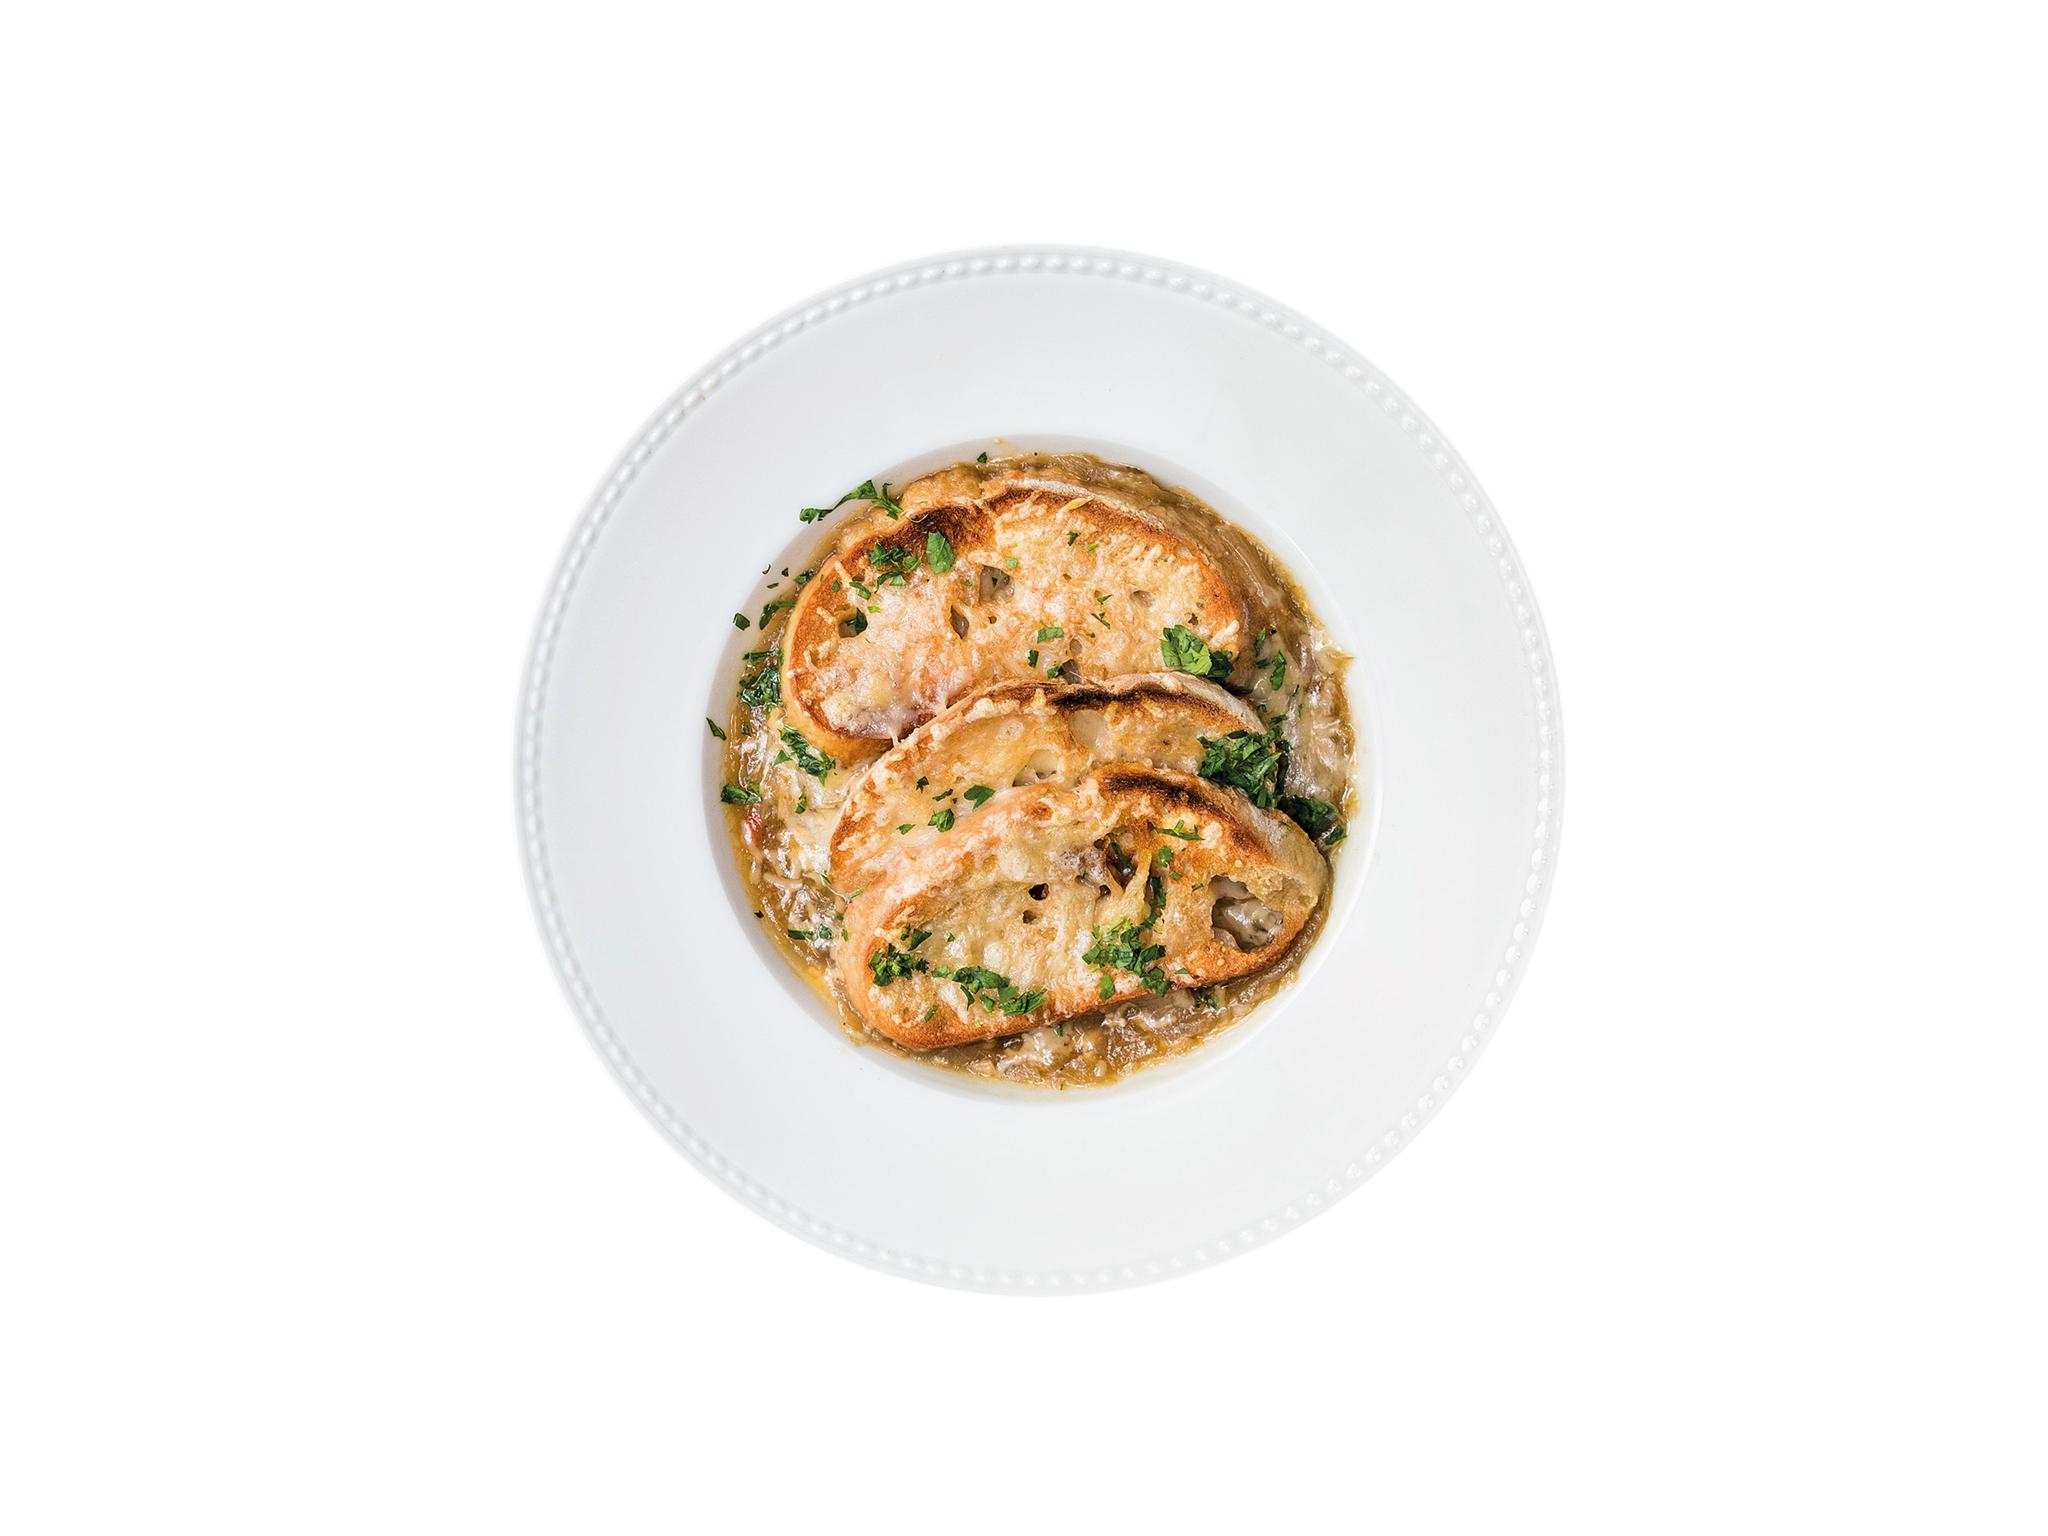 Tasca do Francês - Sopa de Cebola